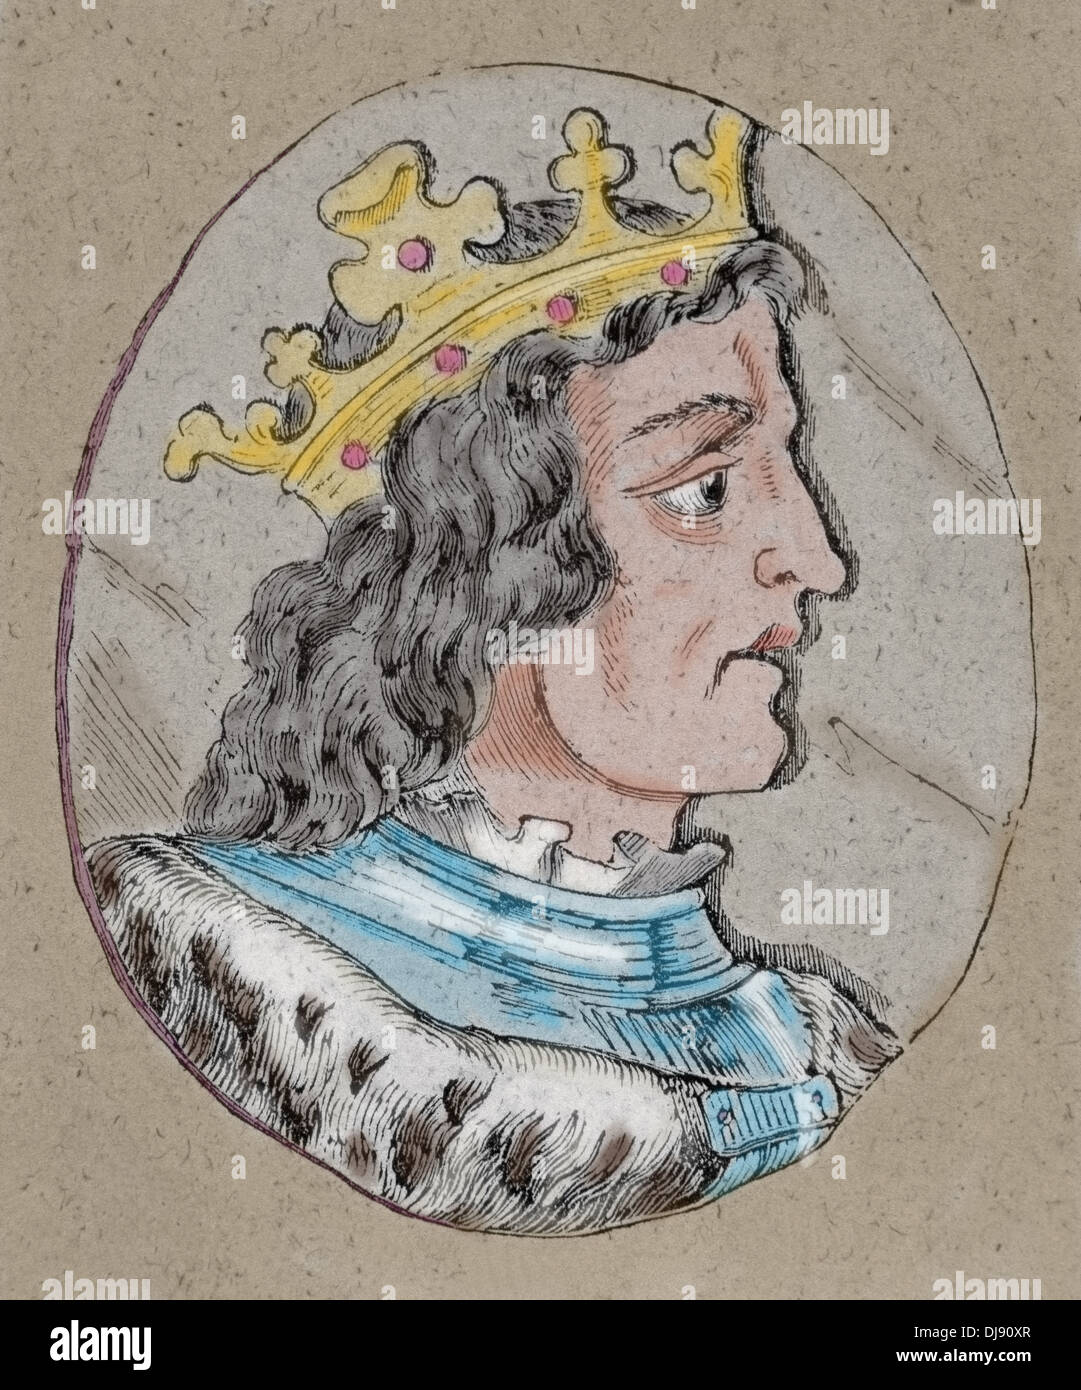 Ramiro III (961-985), roi de León (966-984). La gravure.. De couleur. Photo Stock